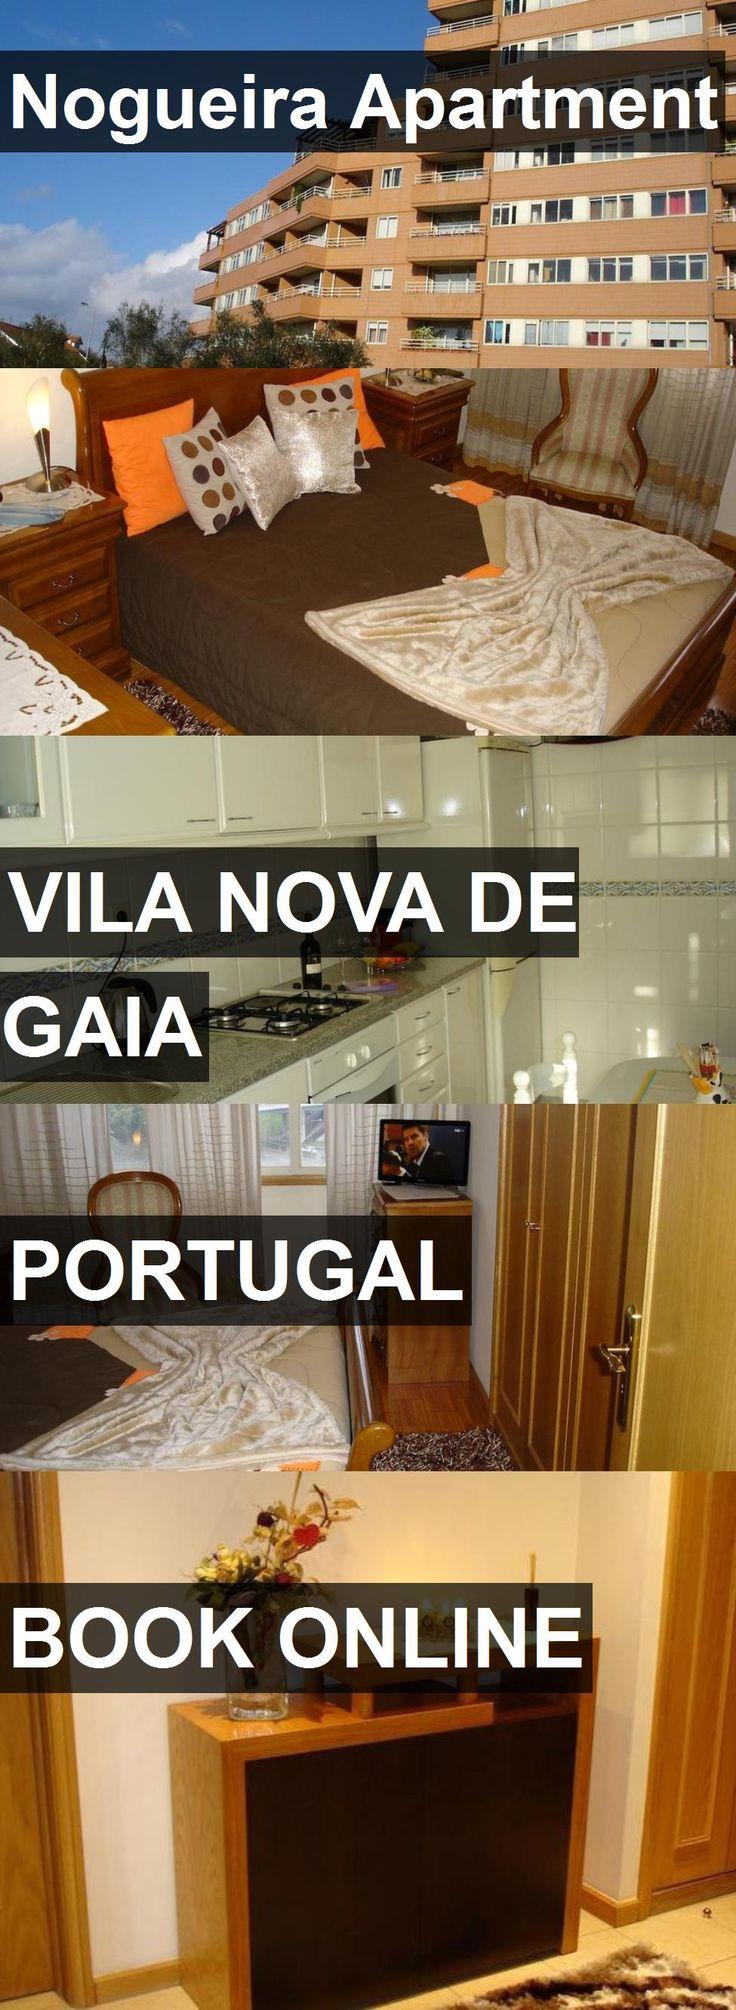 Nogueira Apartment in Vila Nova de Gaia, Portugal. For more information, photos, reviews and best prices please follow the link. #Portugal #VilaNovadeGaia #travel #vacation #apartment